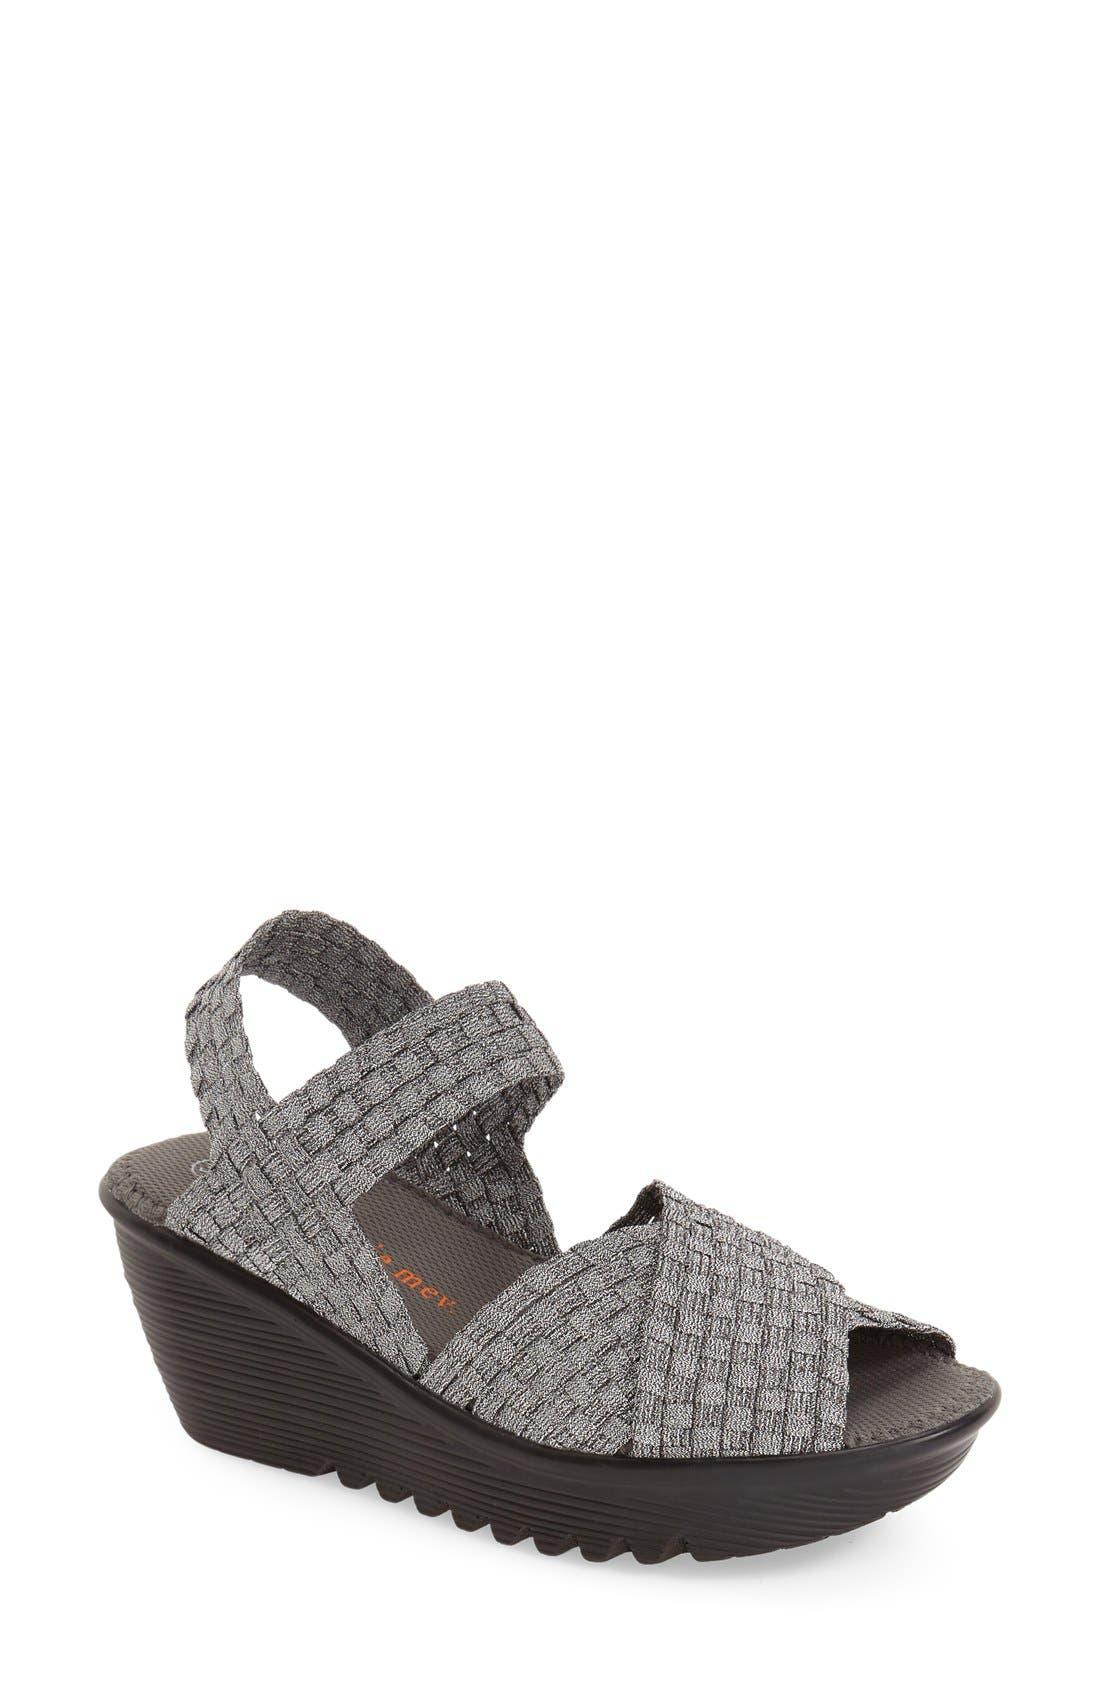 BERNIE MEV. 'Buttercup' Woven Platform Wedge Sandal